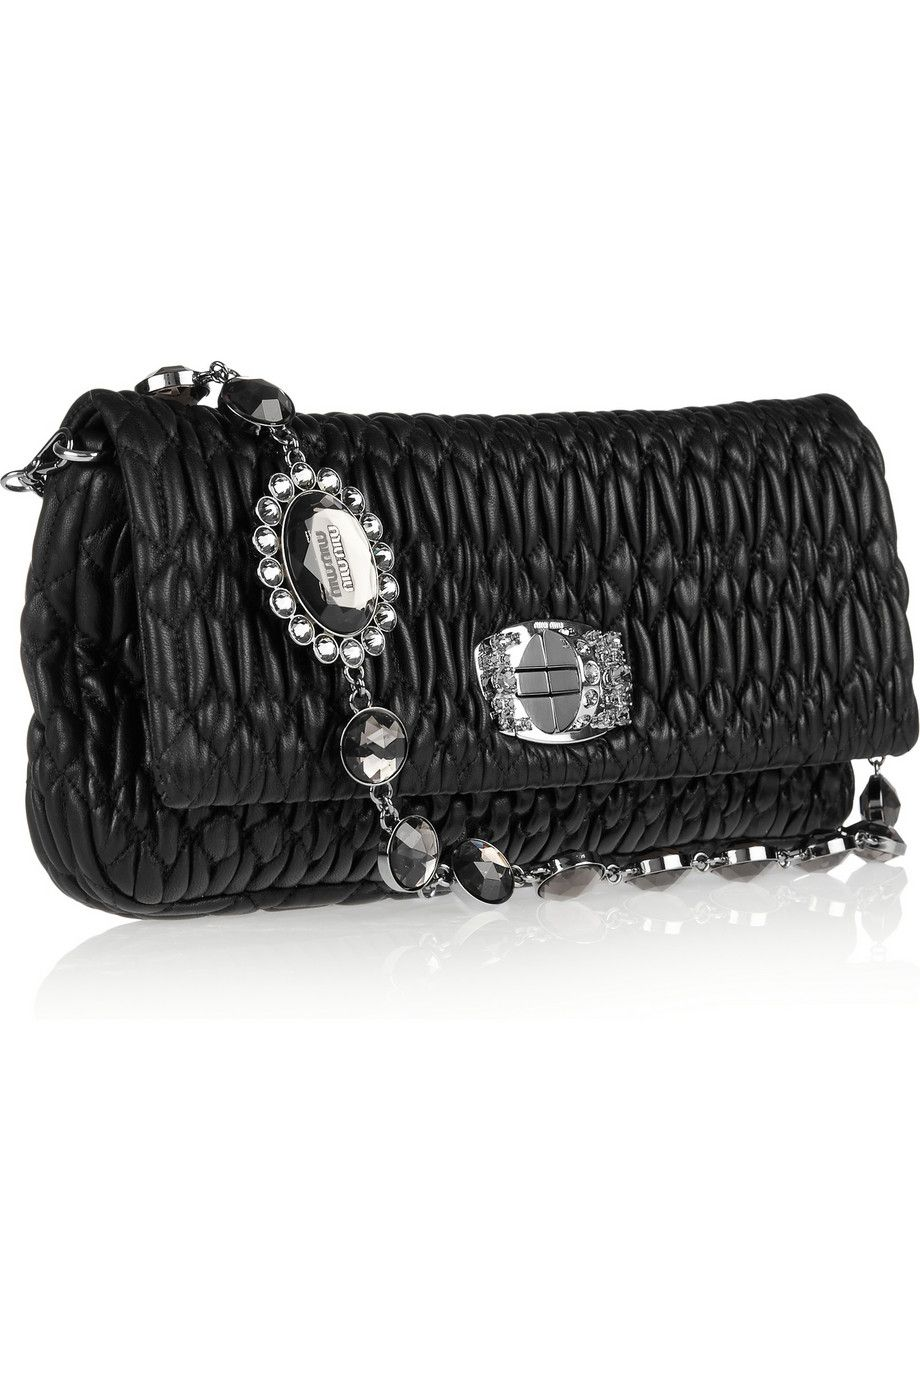 70d86e36fe5 Miu Miu crystal chain strap matelasse leather shoulder bag ...